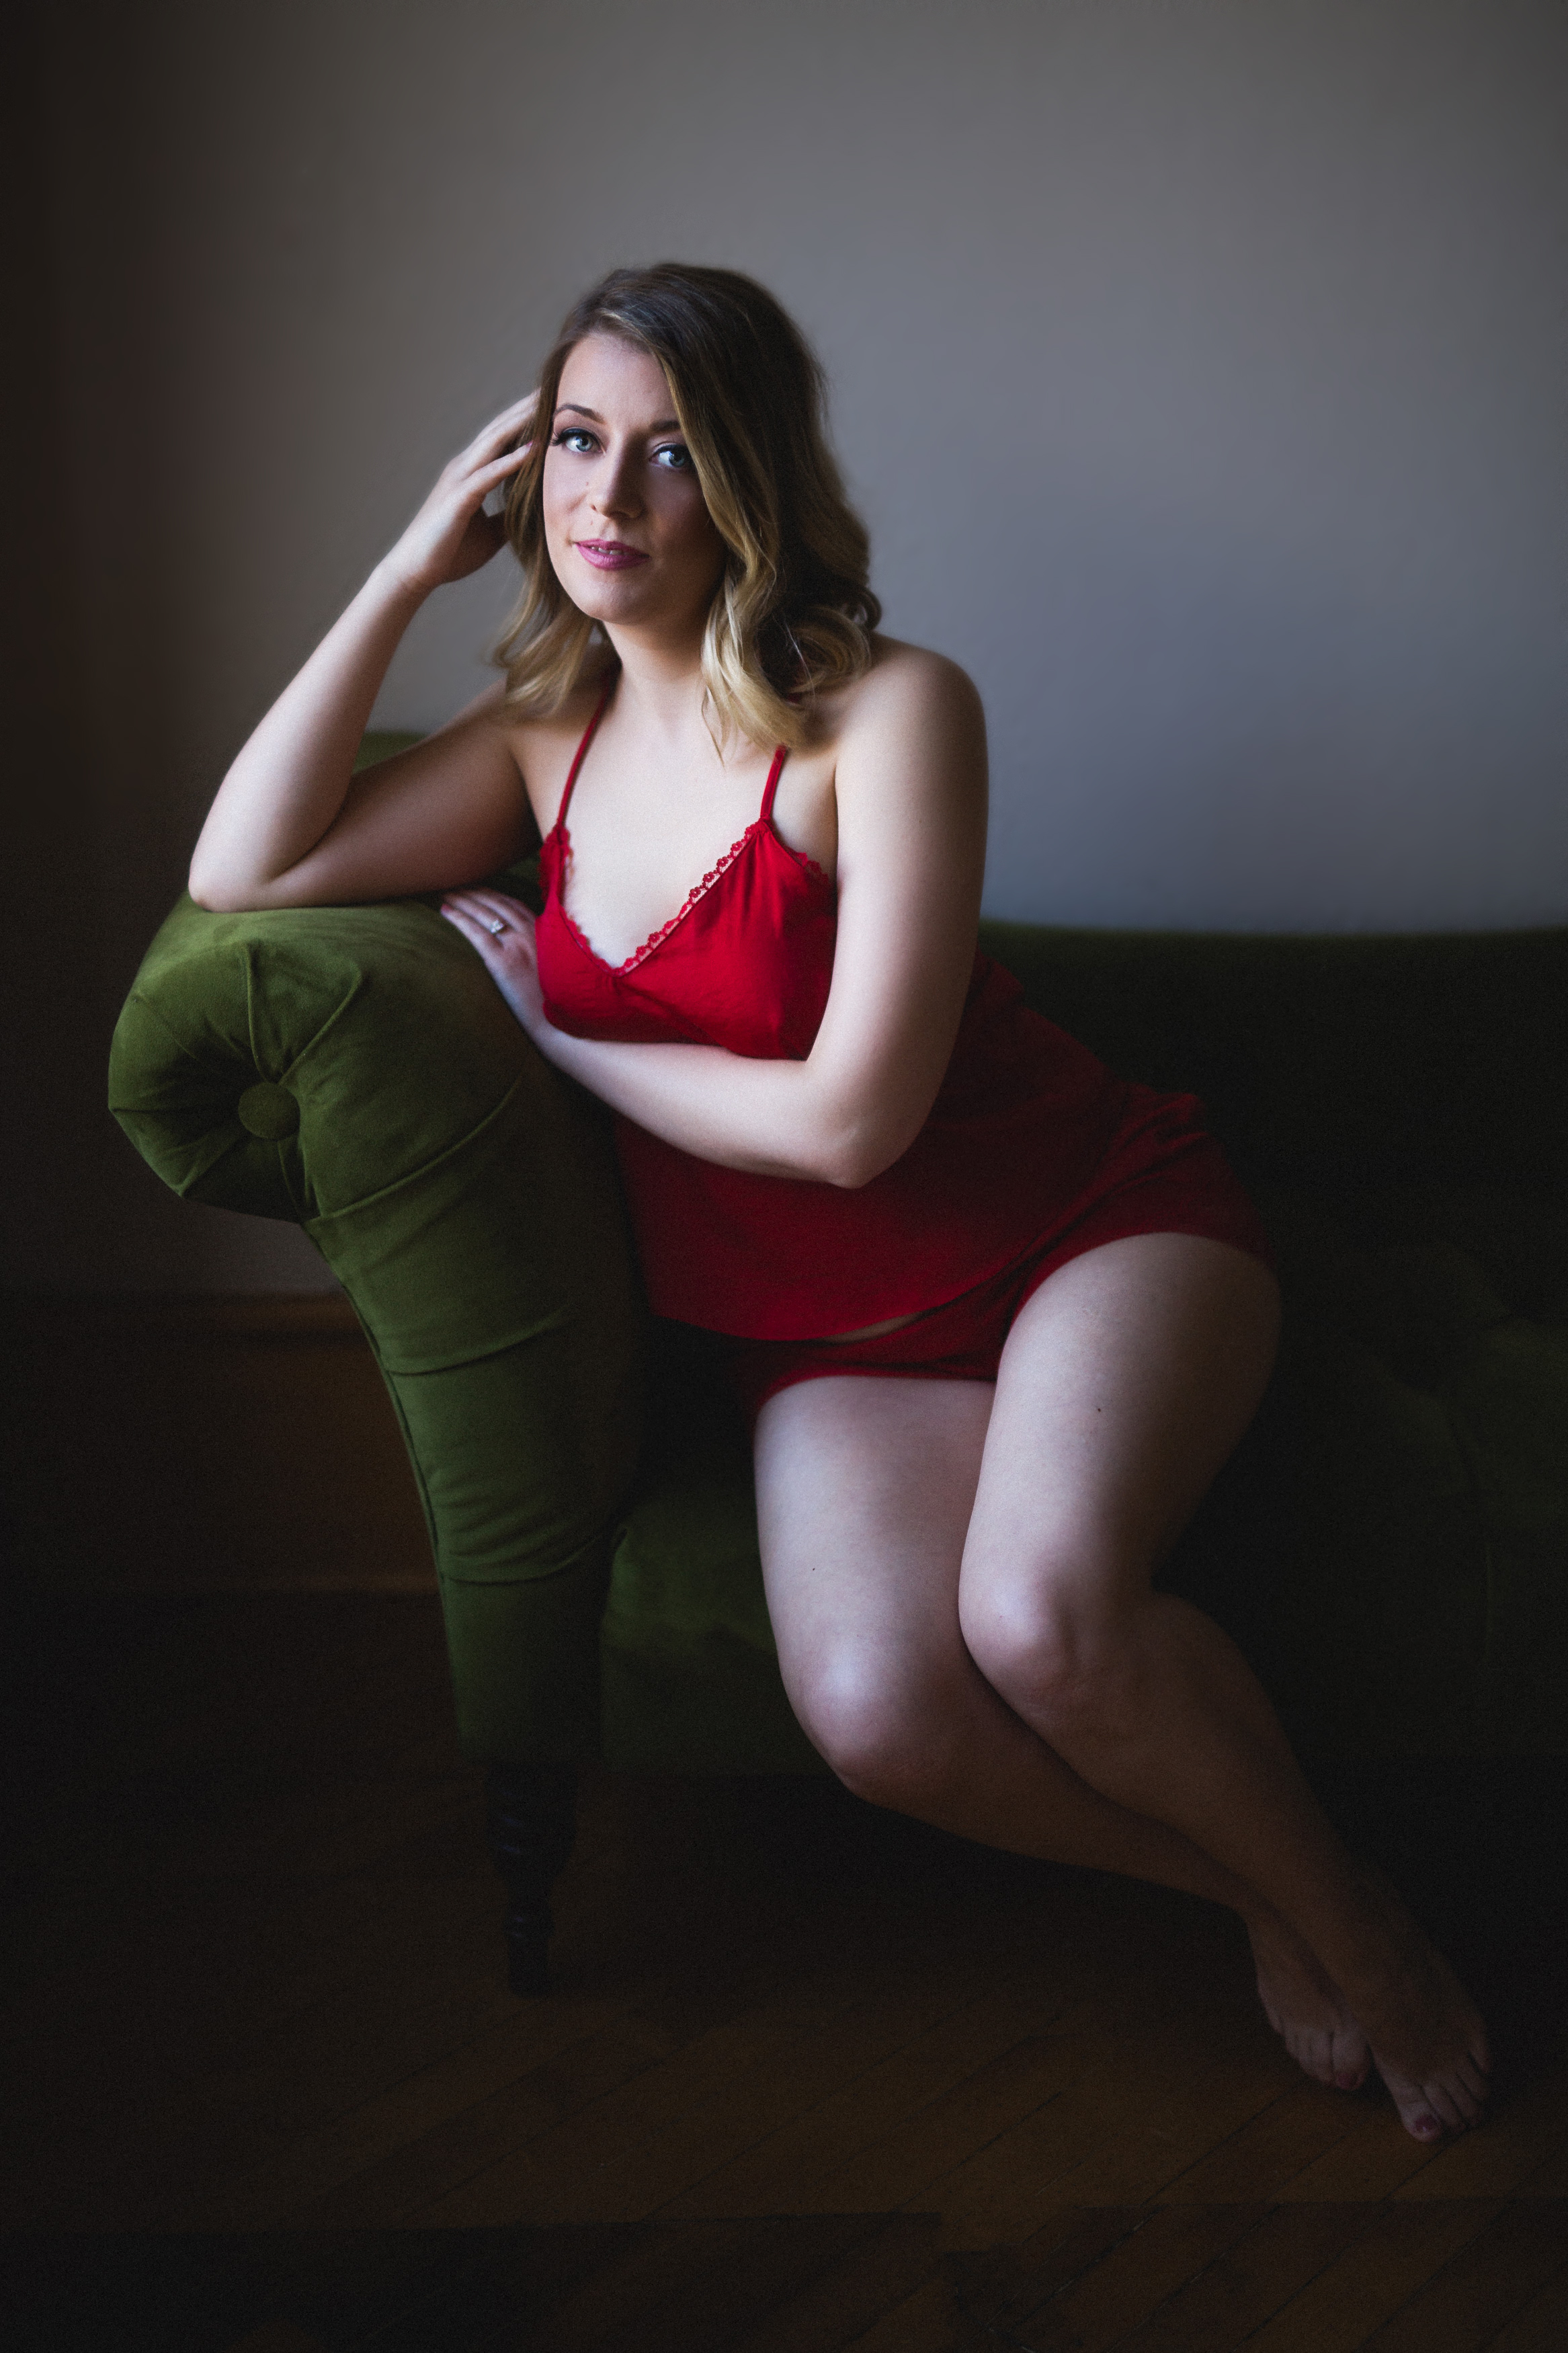 okc boudoir photographer norman oklahoma edmond okc boudoir for humans with bodies tattoo boudoir real bodies body positivity stretch marks